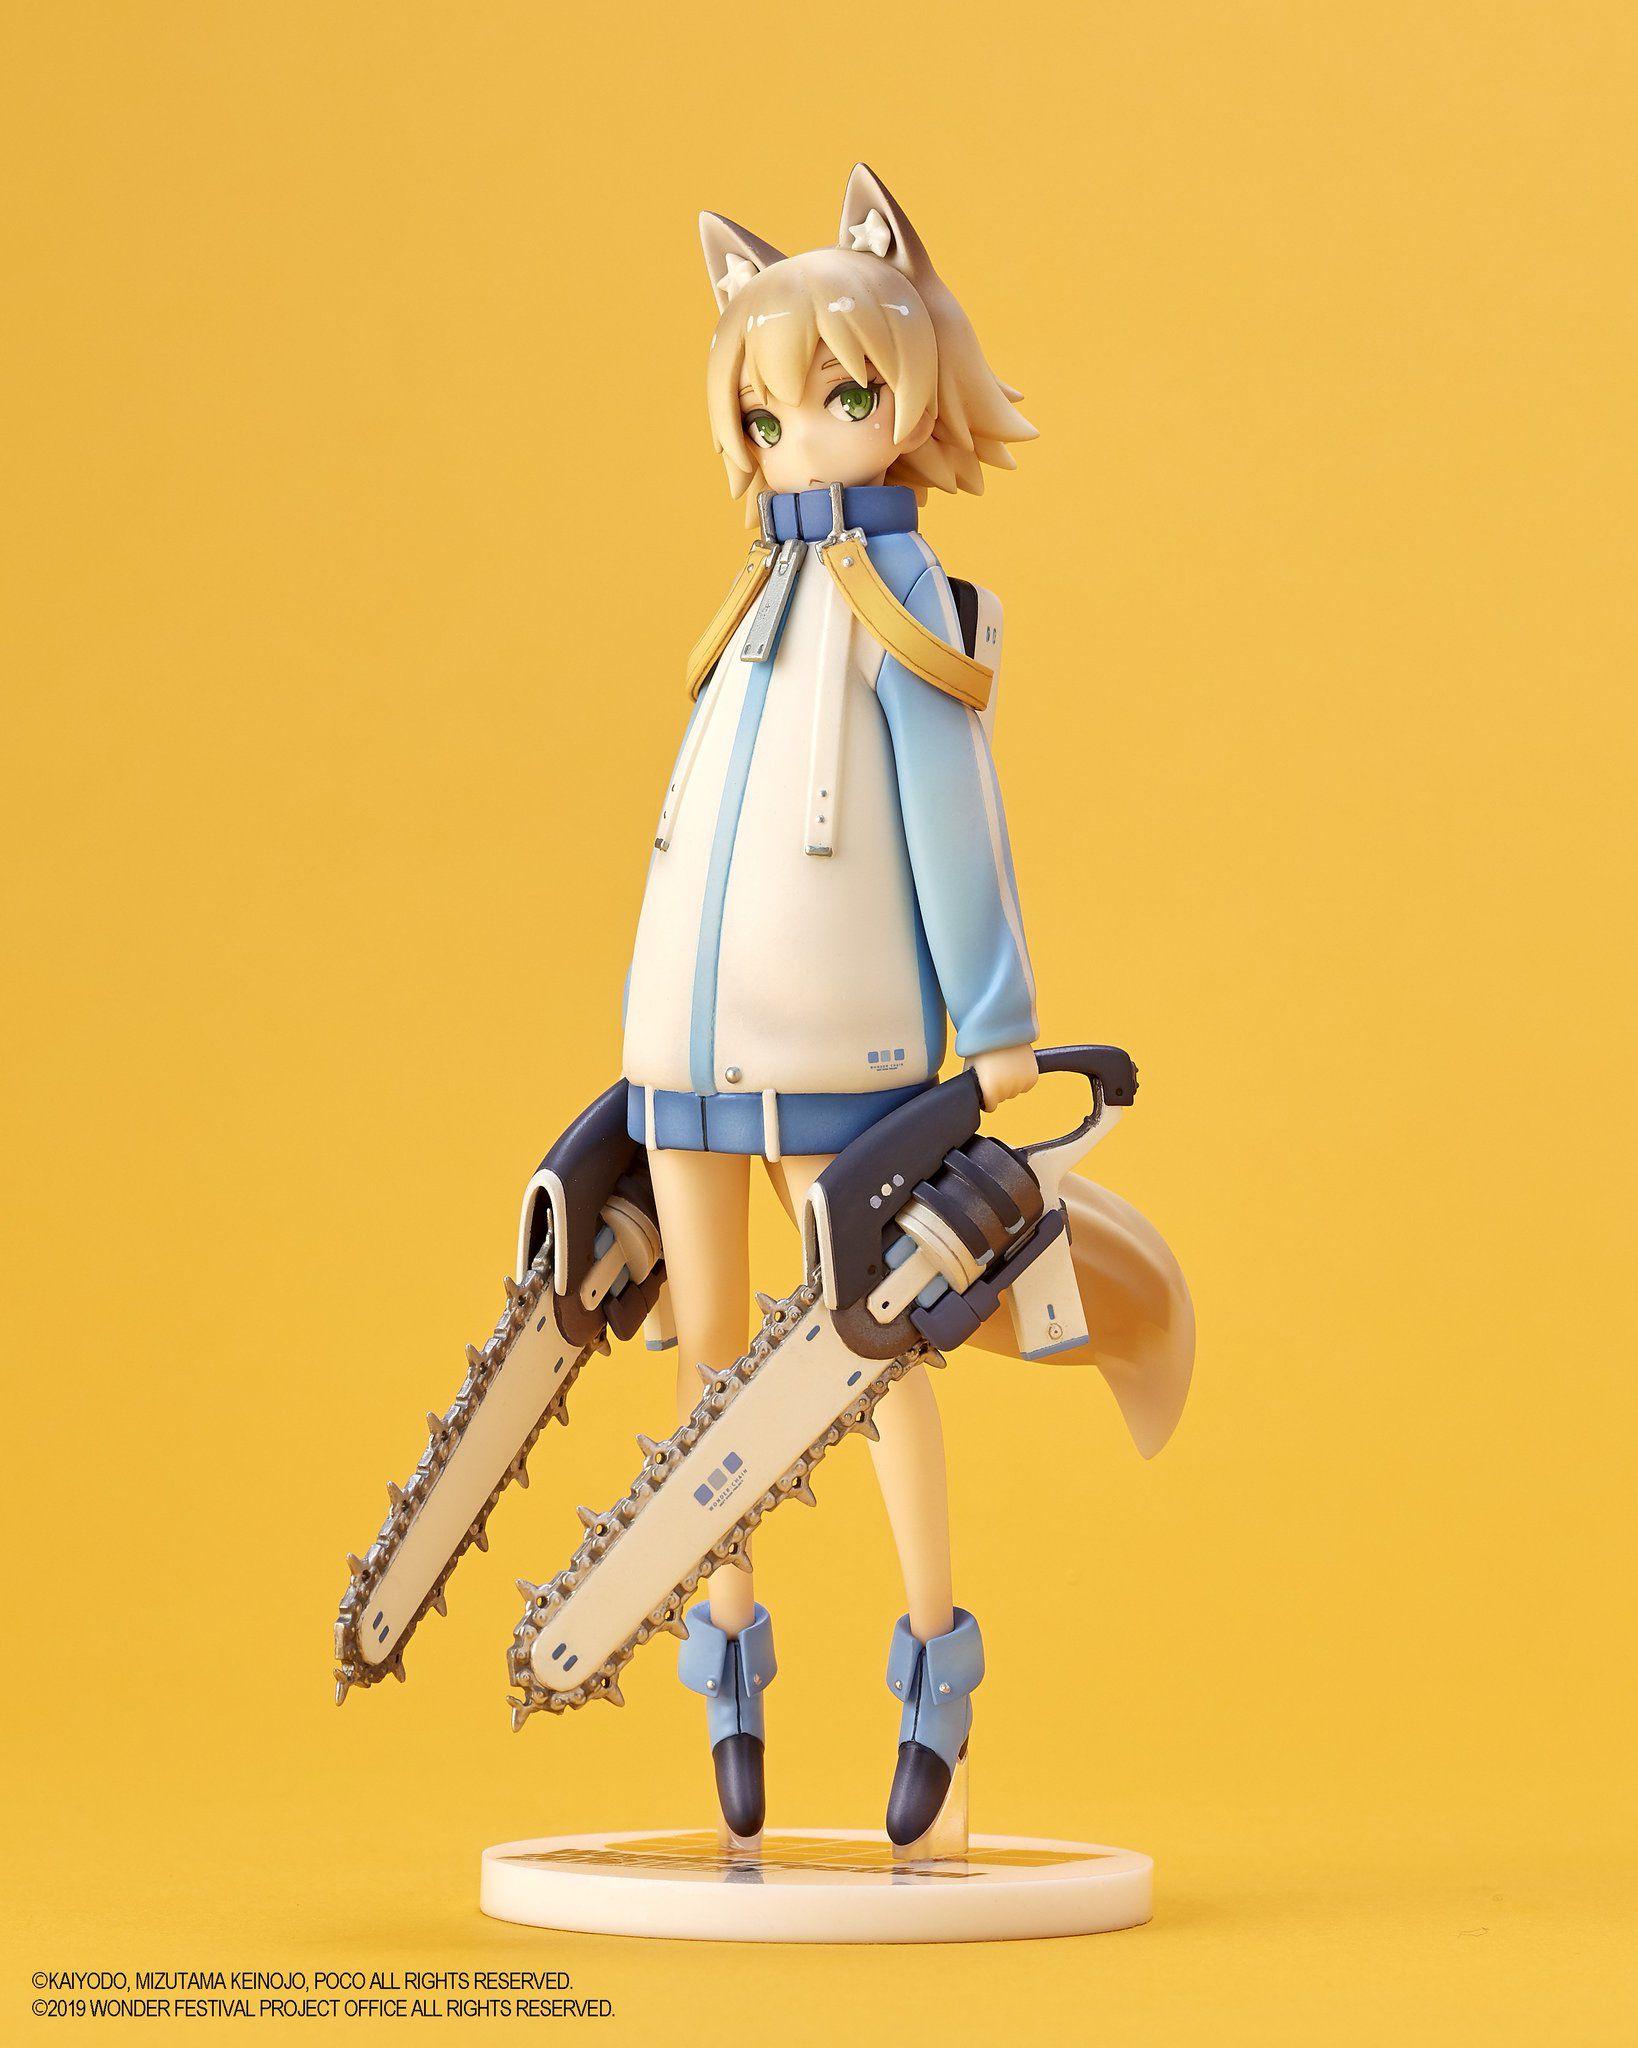 「Character 3D」おしゃれまとめの人気アイデア Pinterest Wataru Ono エルドラ